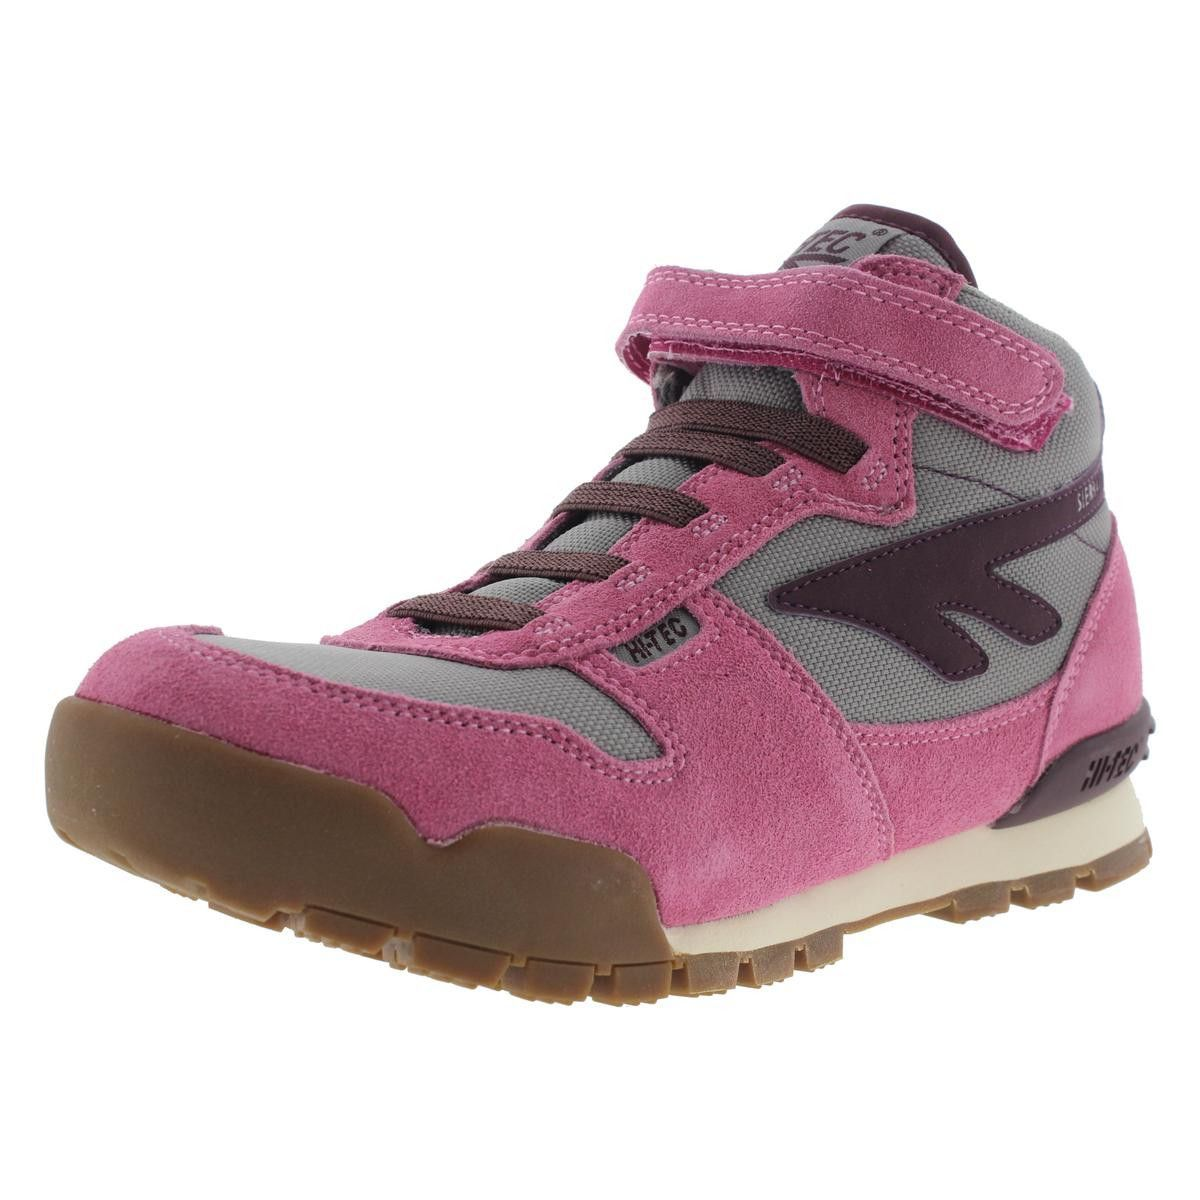 Hi-Tec Girls Sierra Lite Original JR Suede Mesh Hiking Boots